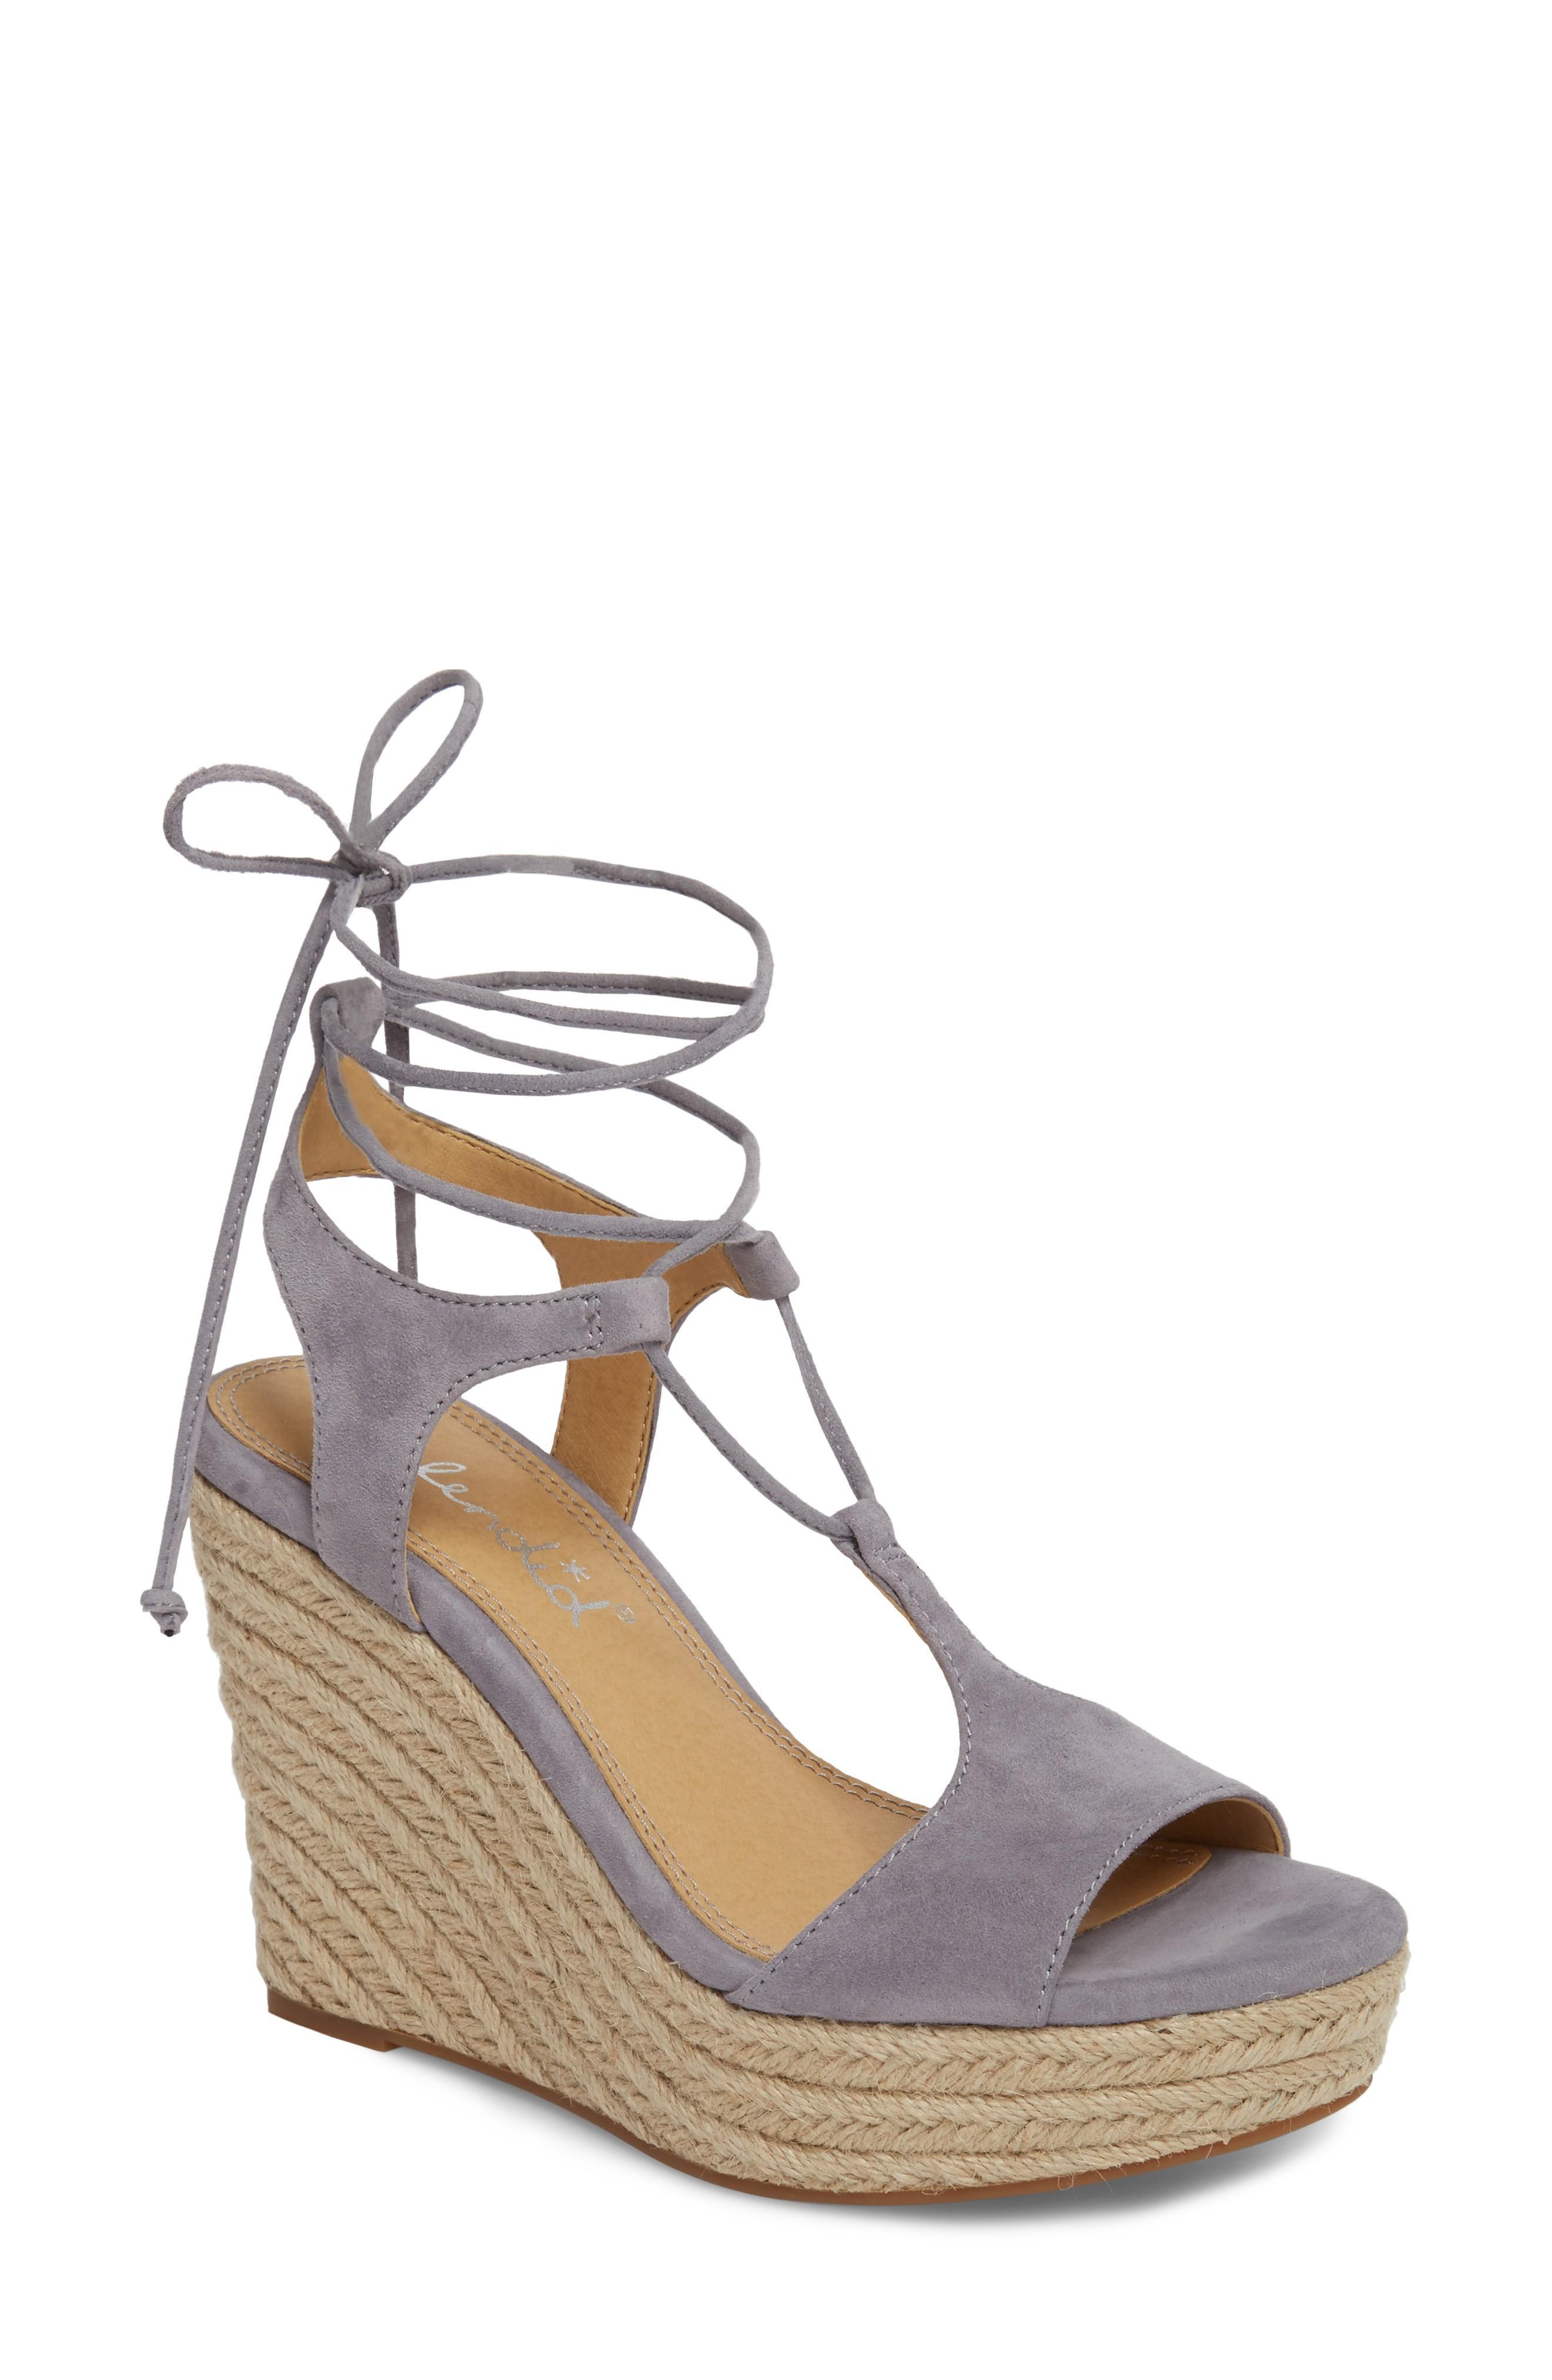 4656835f1 Splendid Fianna Espadrille Wedge Sandal In Steel Grey Suede | ModeSens